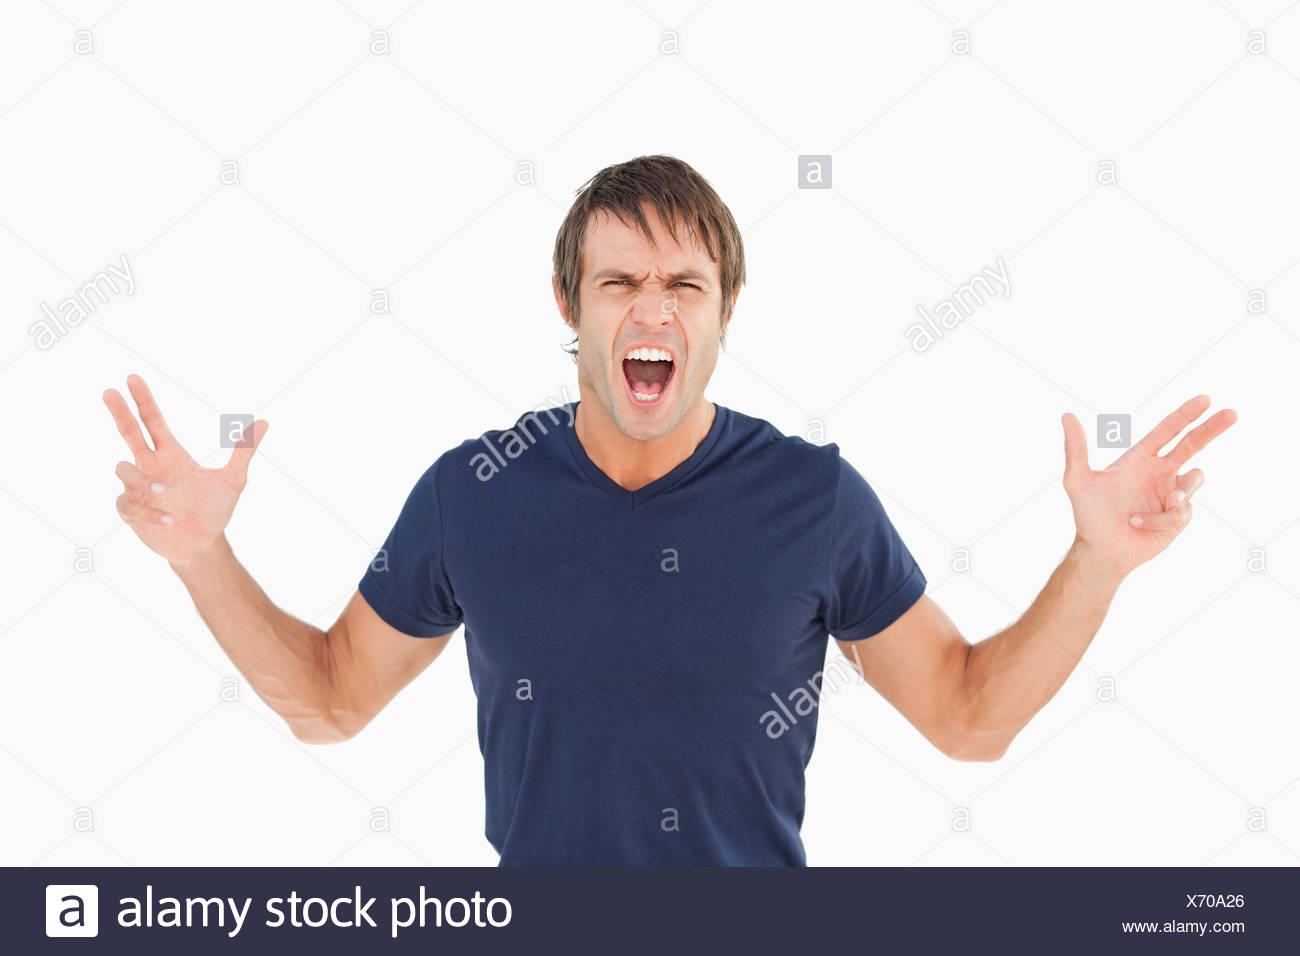 Furious man shouting while raising his arms - Stock Image